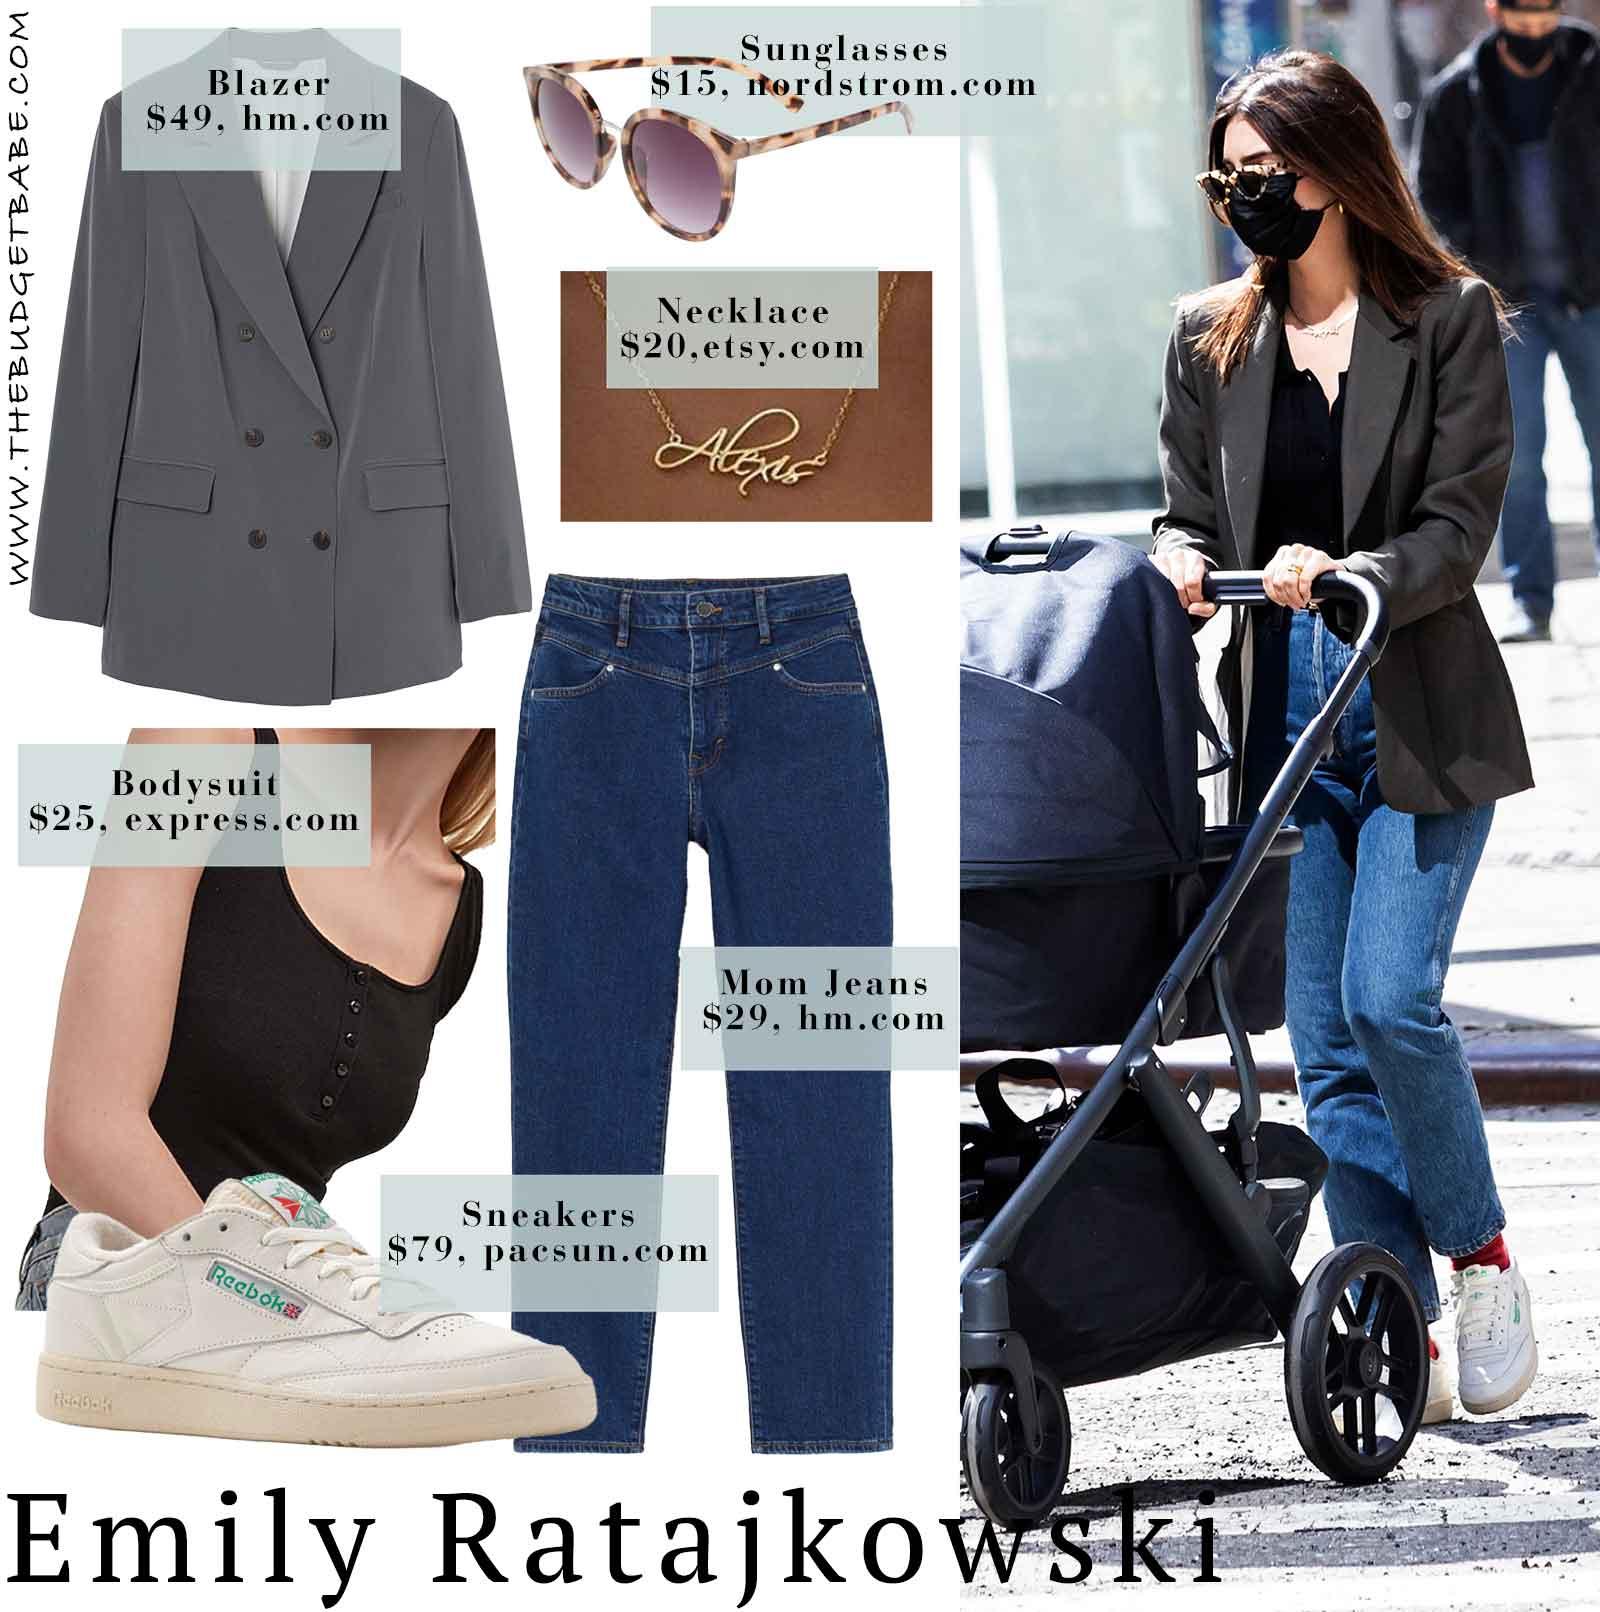 Emily Ratajkowski's boyfriend blazer, mom jeans, and Reebok sneakers look for less